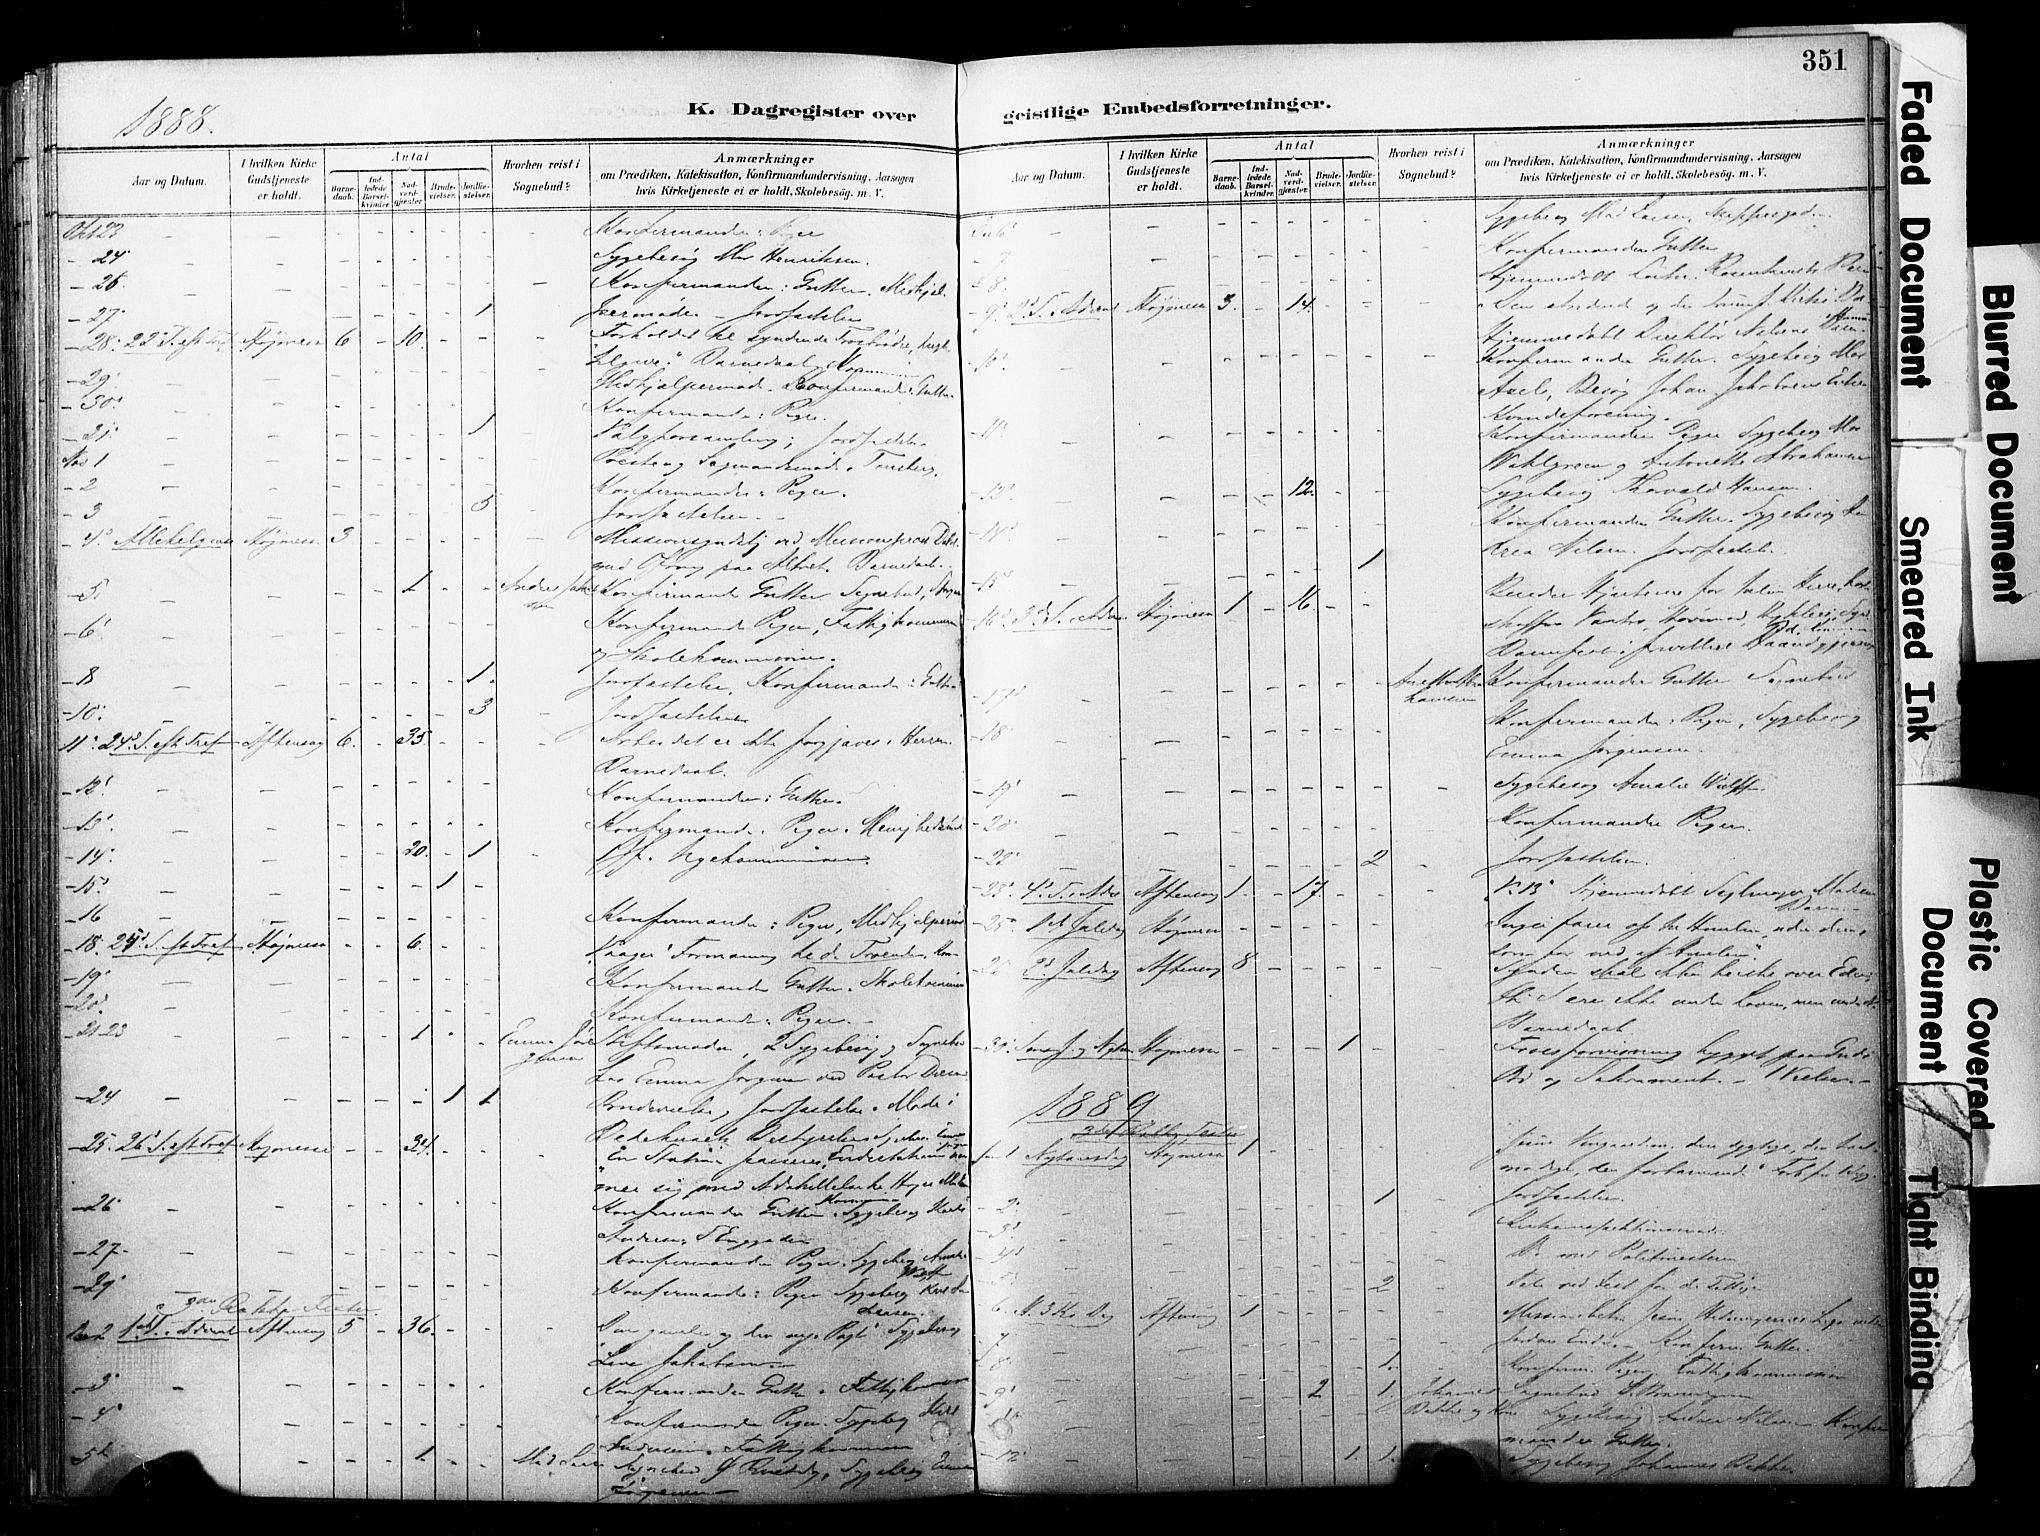 SAKO, Horten kirkebøker, F/Fa/L0004: Parish register (official) no. 4, 1888-1895, p. 351